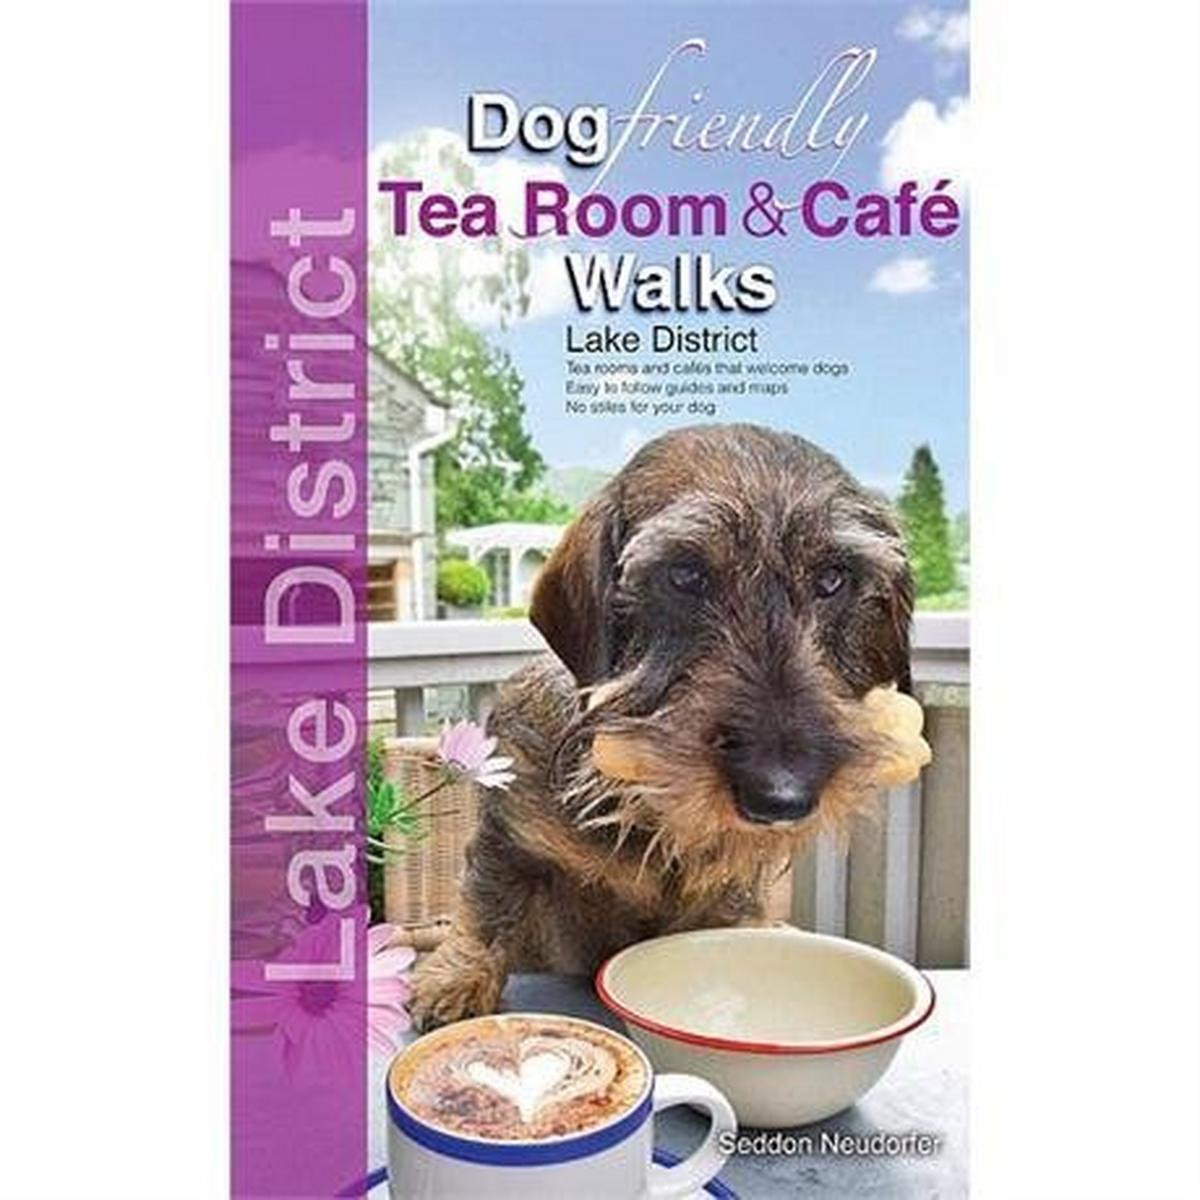 Miscellaneous Book: Dog Friendly Tea Room & Cafe Walks - Lake District